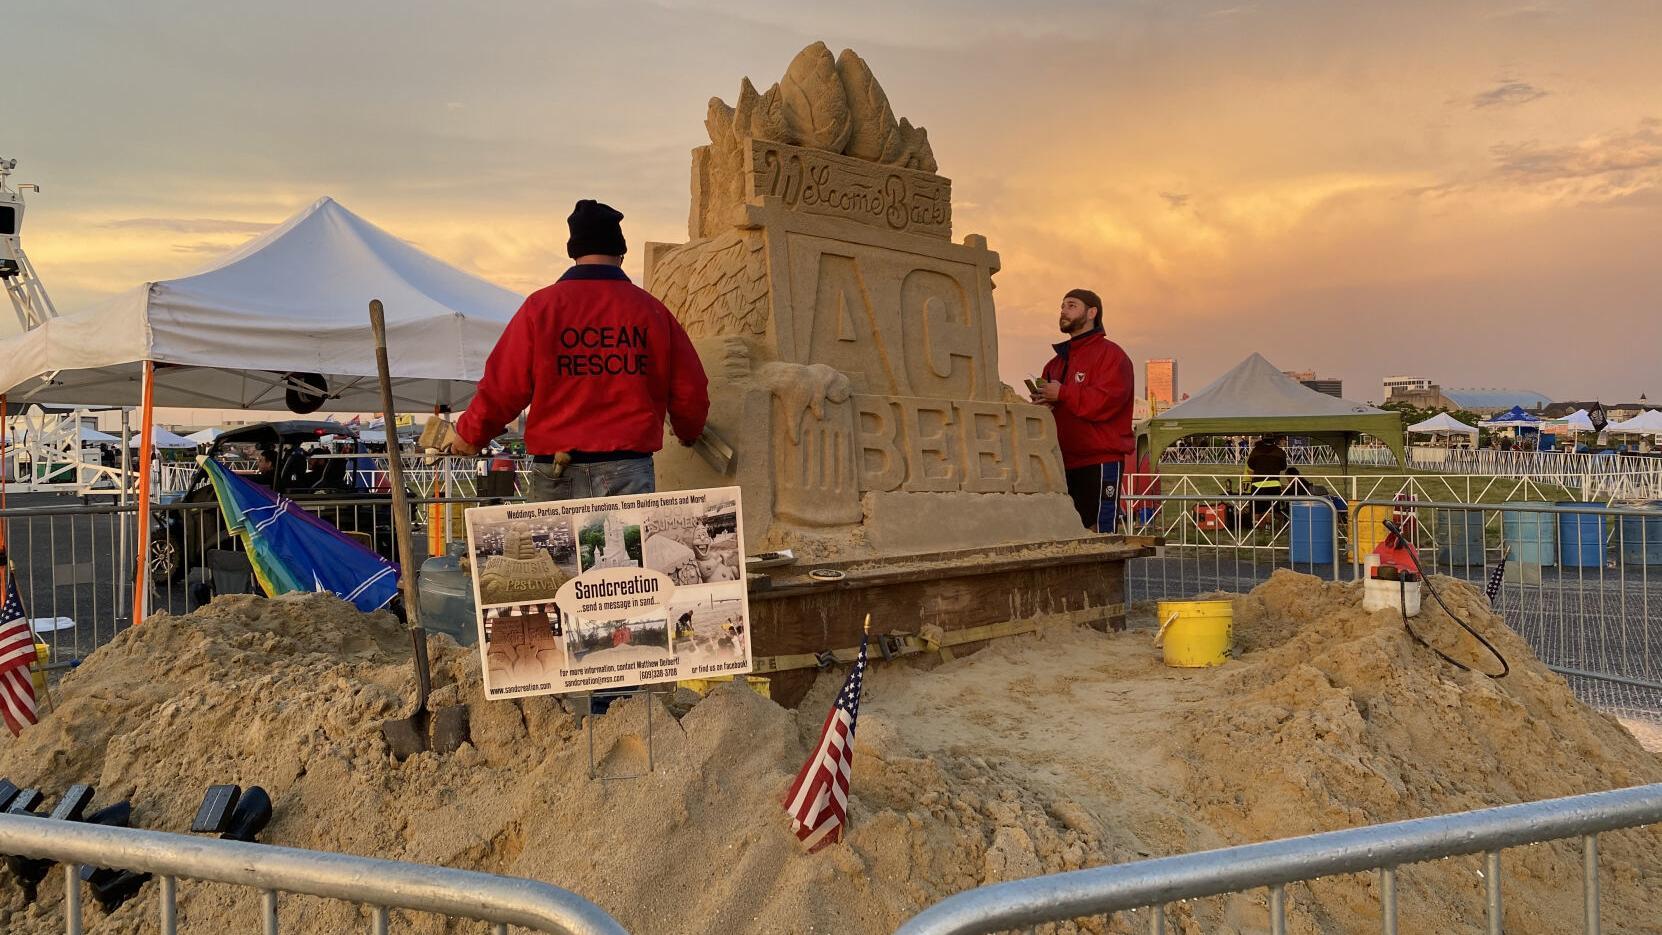 Atlantic City Beer & Music Festival kicks off with wet Friday night